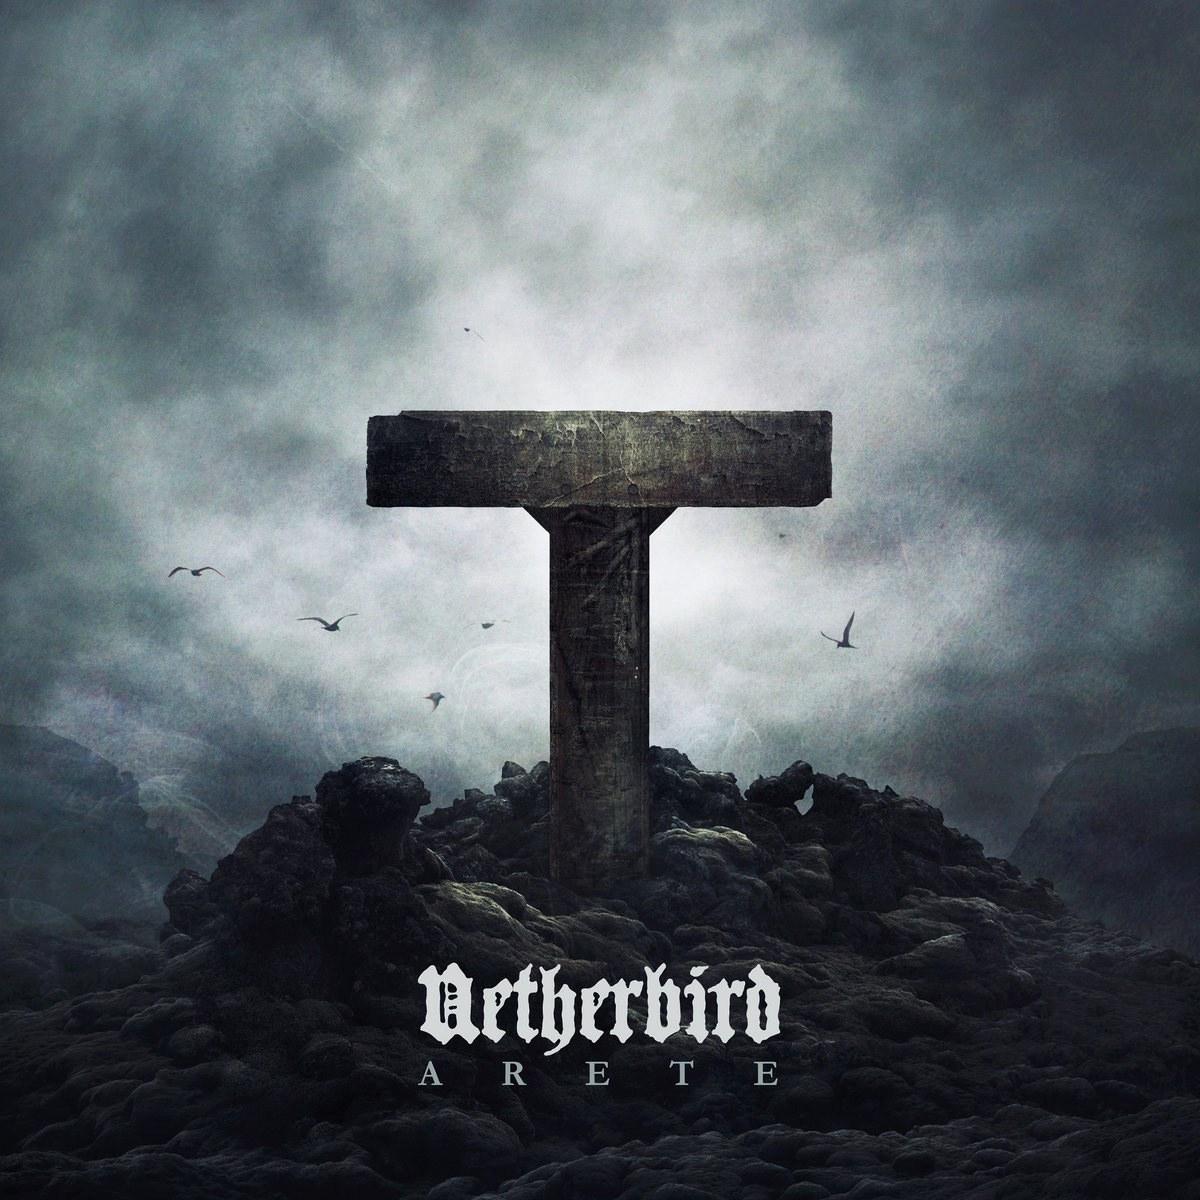 Netherbird - Arete